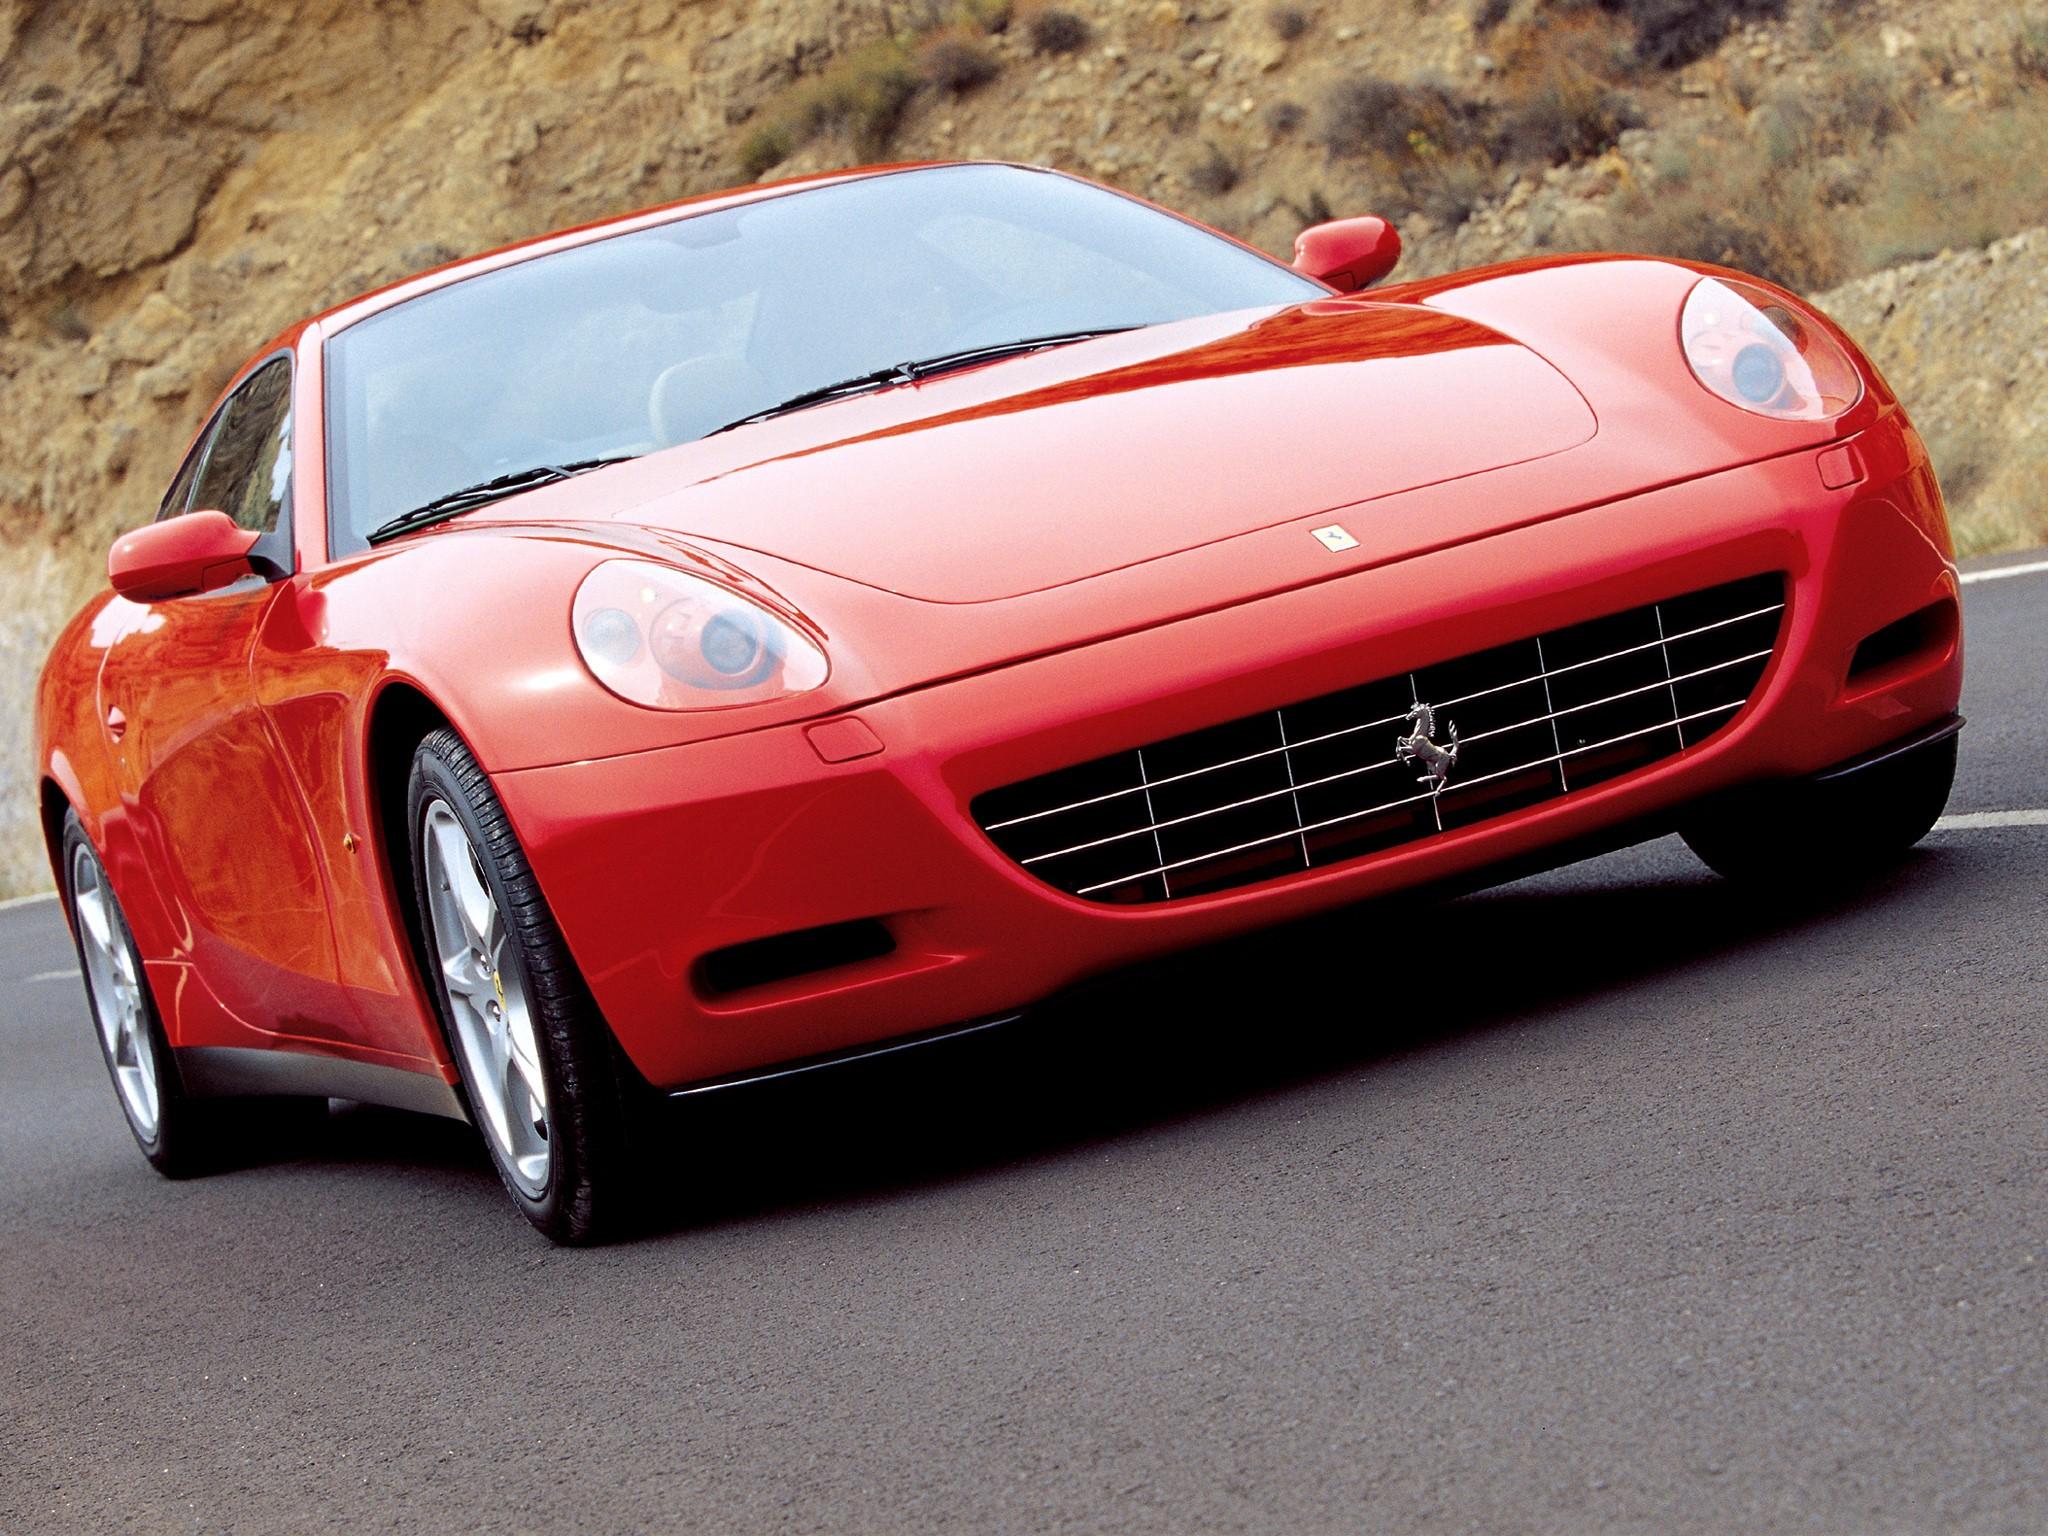 Ferrari 612 Scaglietti Specs Amp Photos 2004 2005 2006 2007 2008 2009 2010 2011